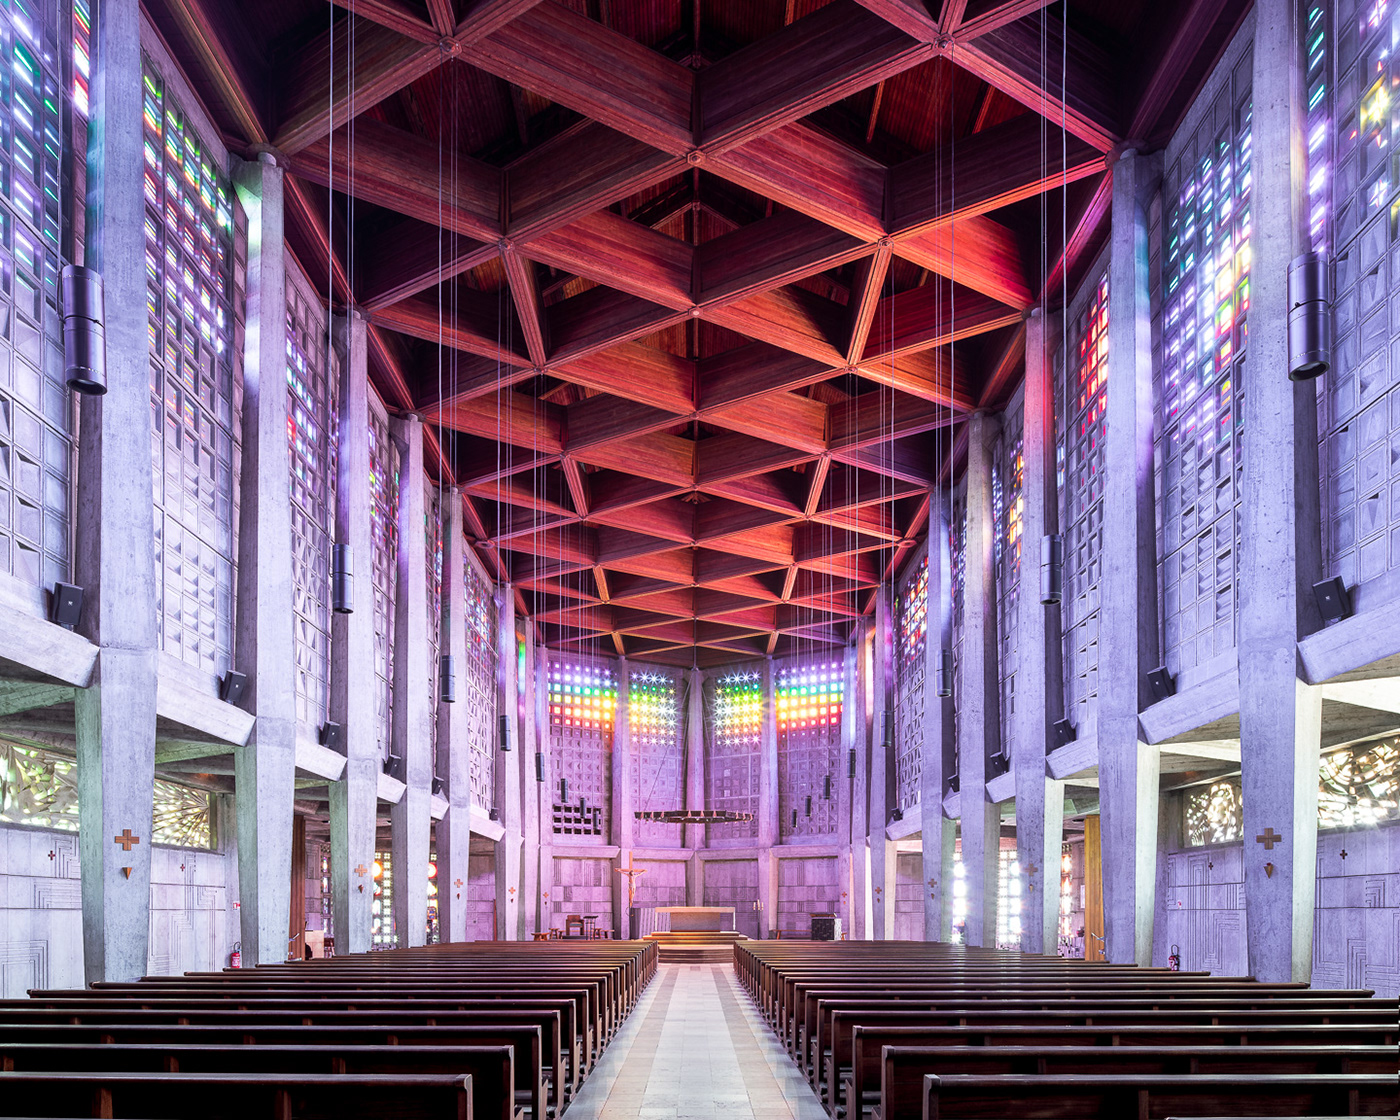 architecture cathedral Catholic church concrete Europe Interior modernarchitecture sacred sacredspaces